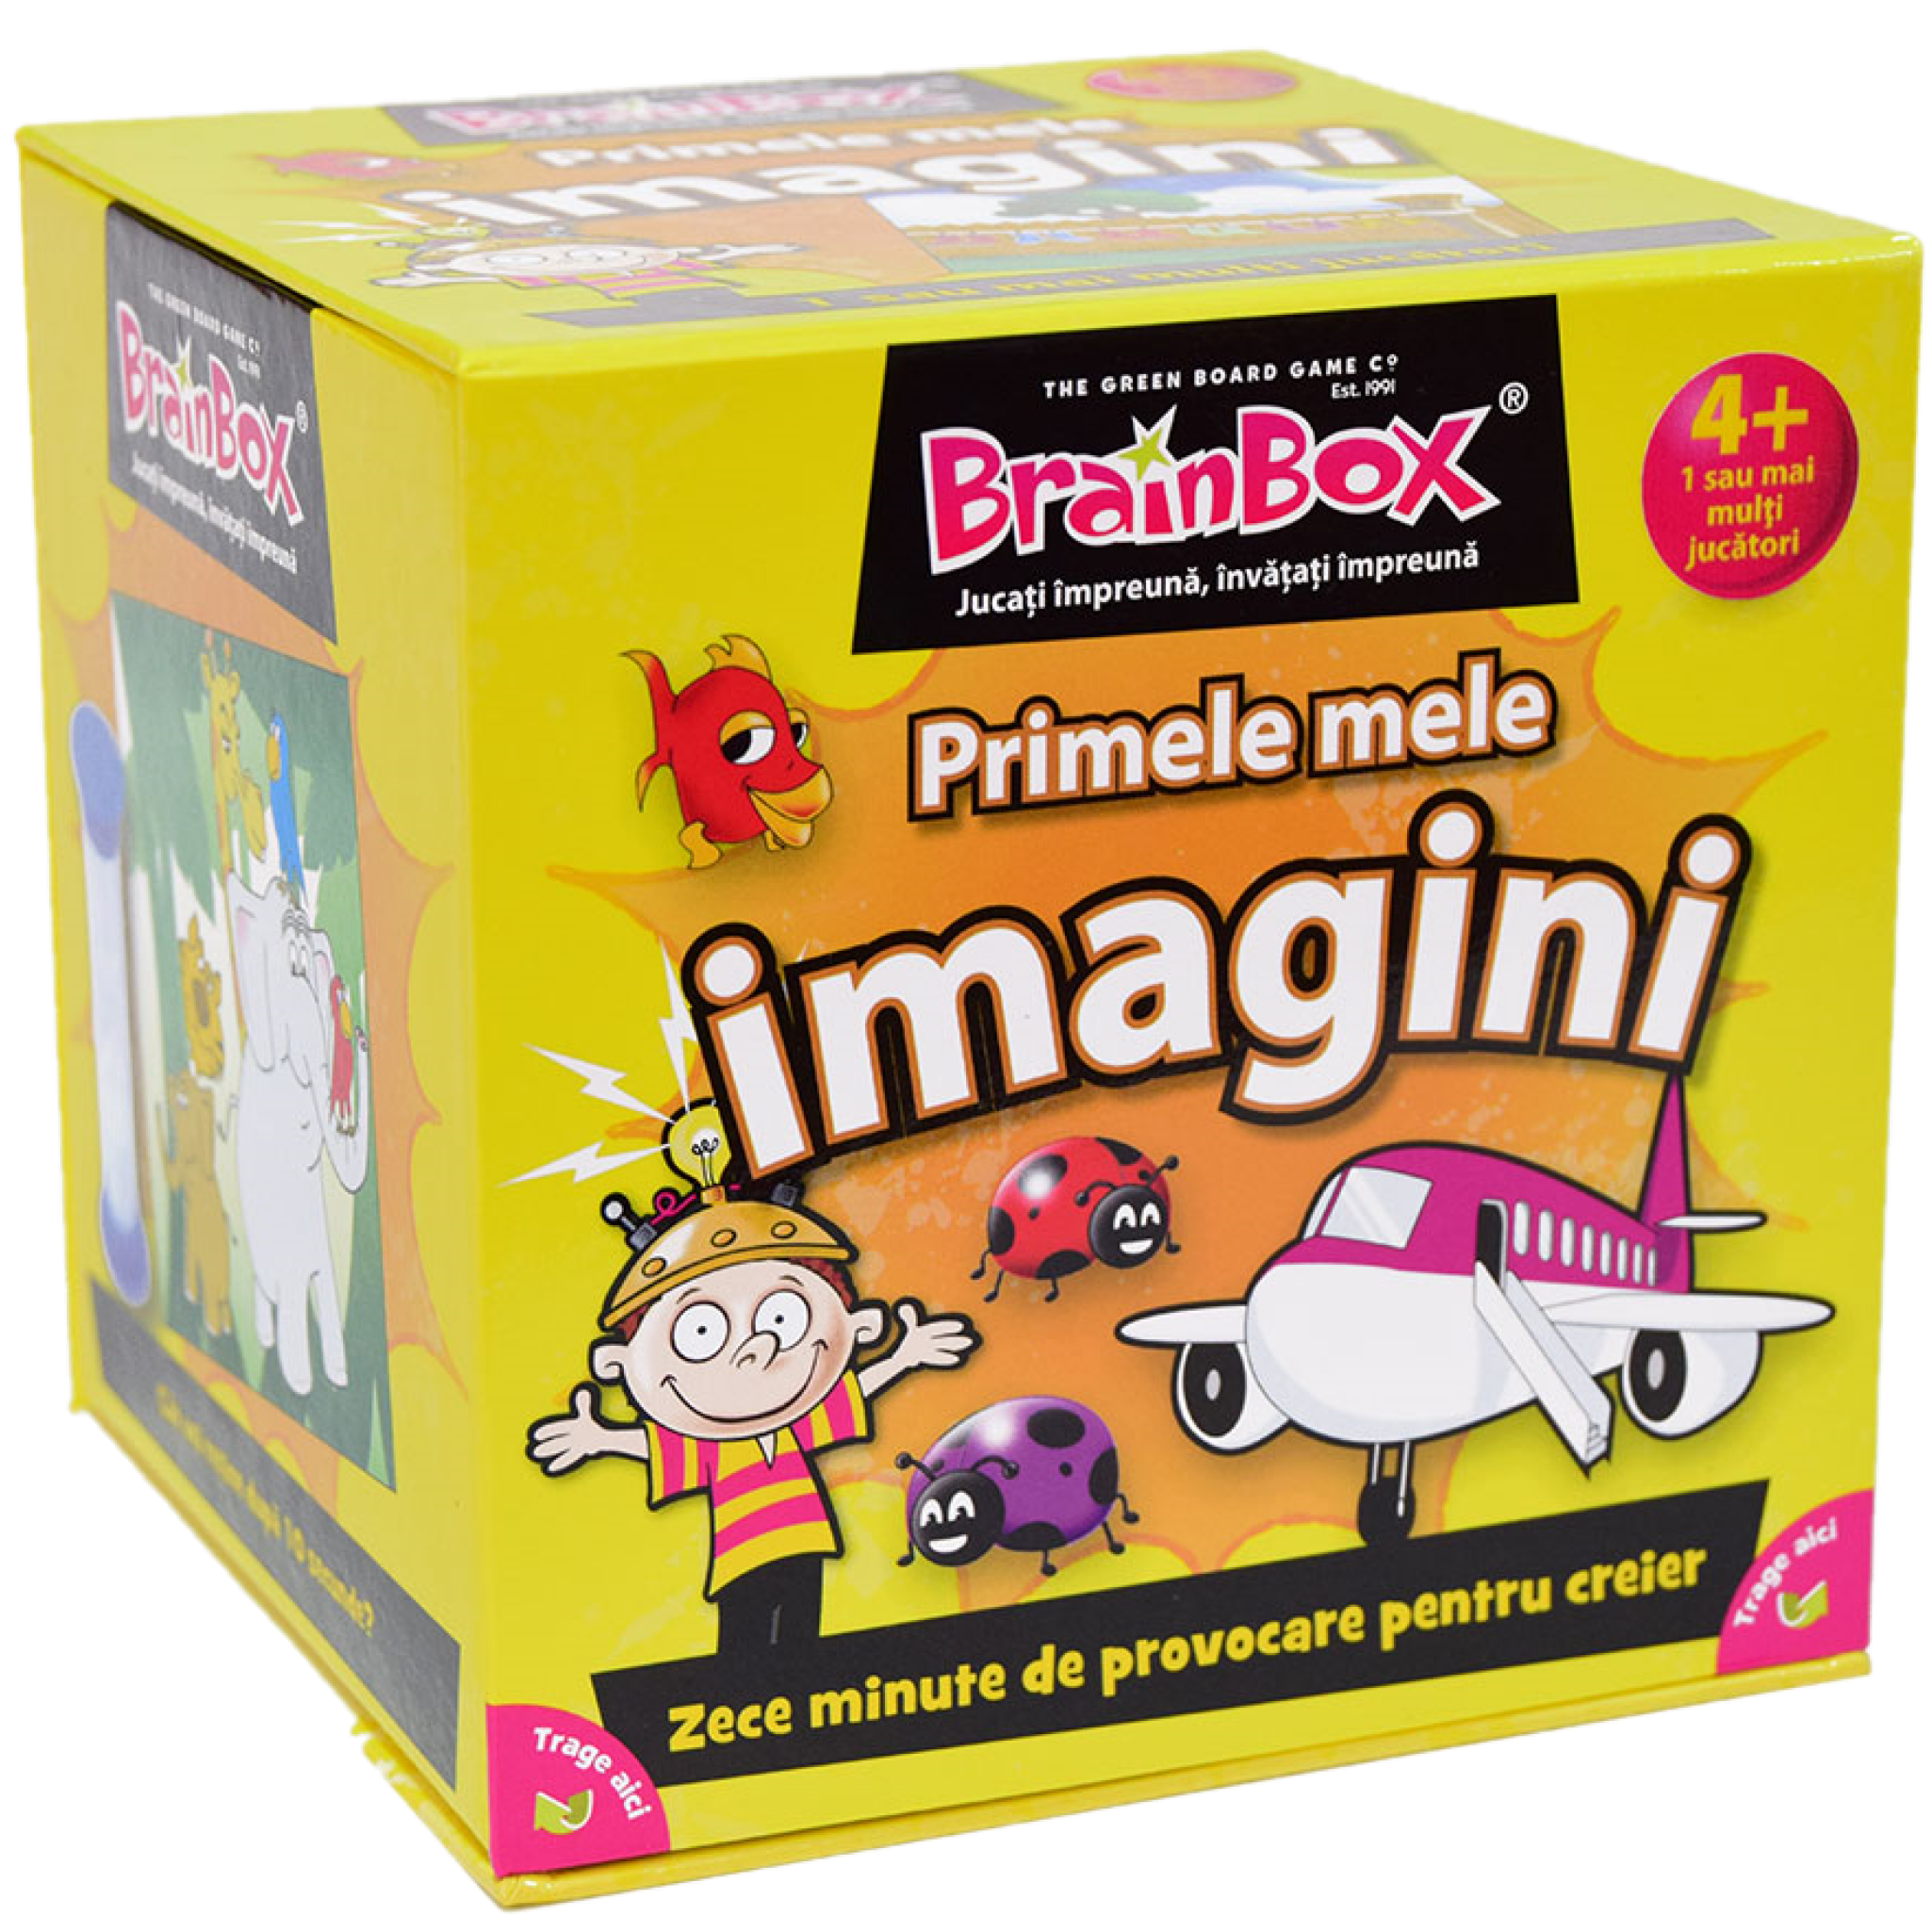 Primele mele imagini - BrainBox